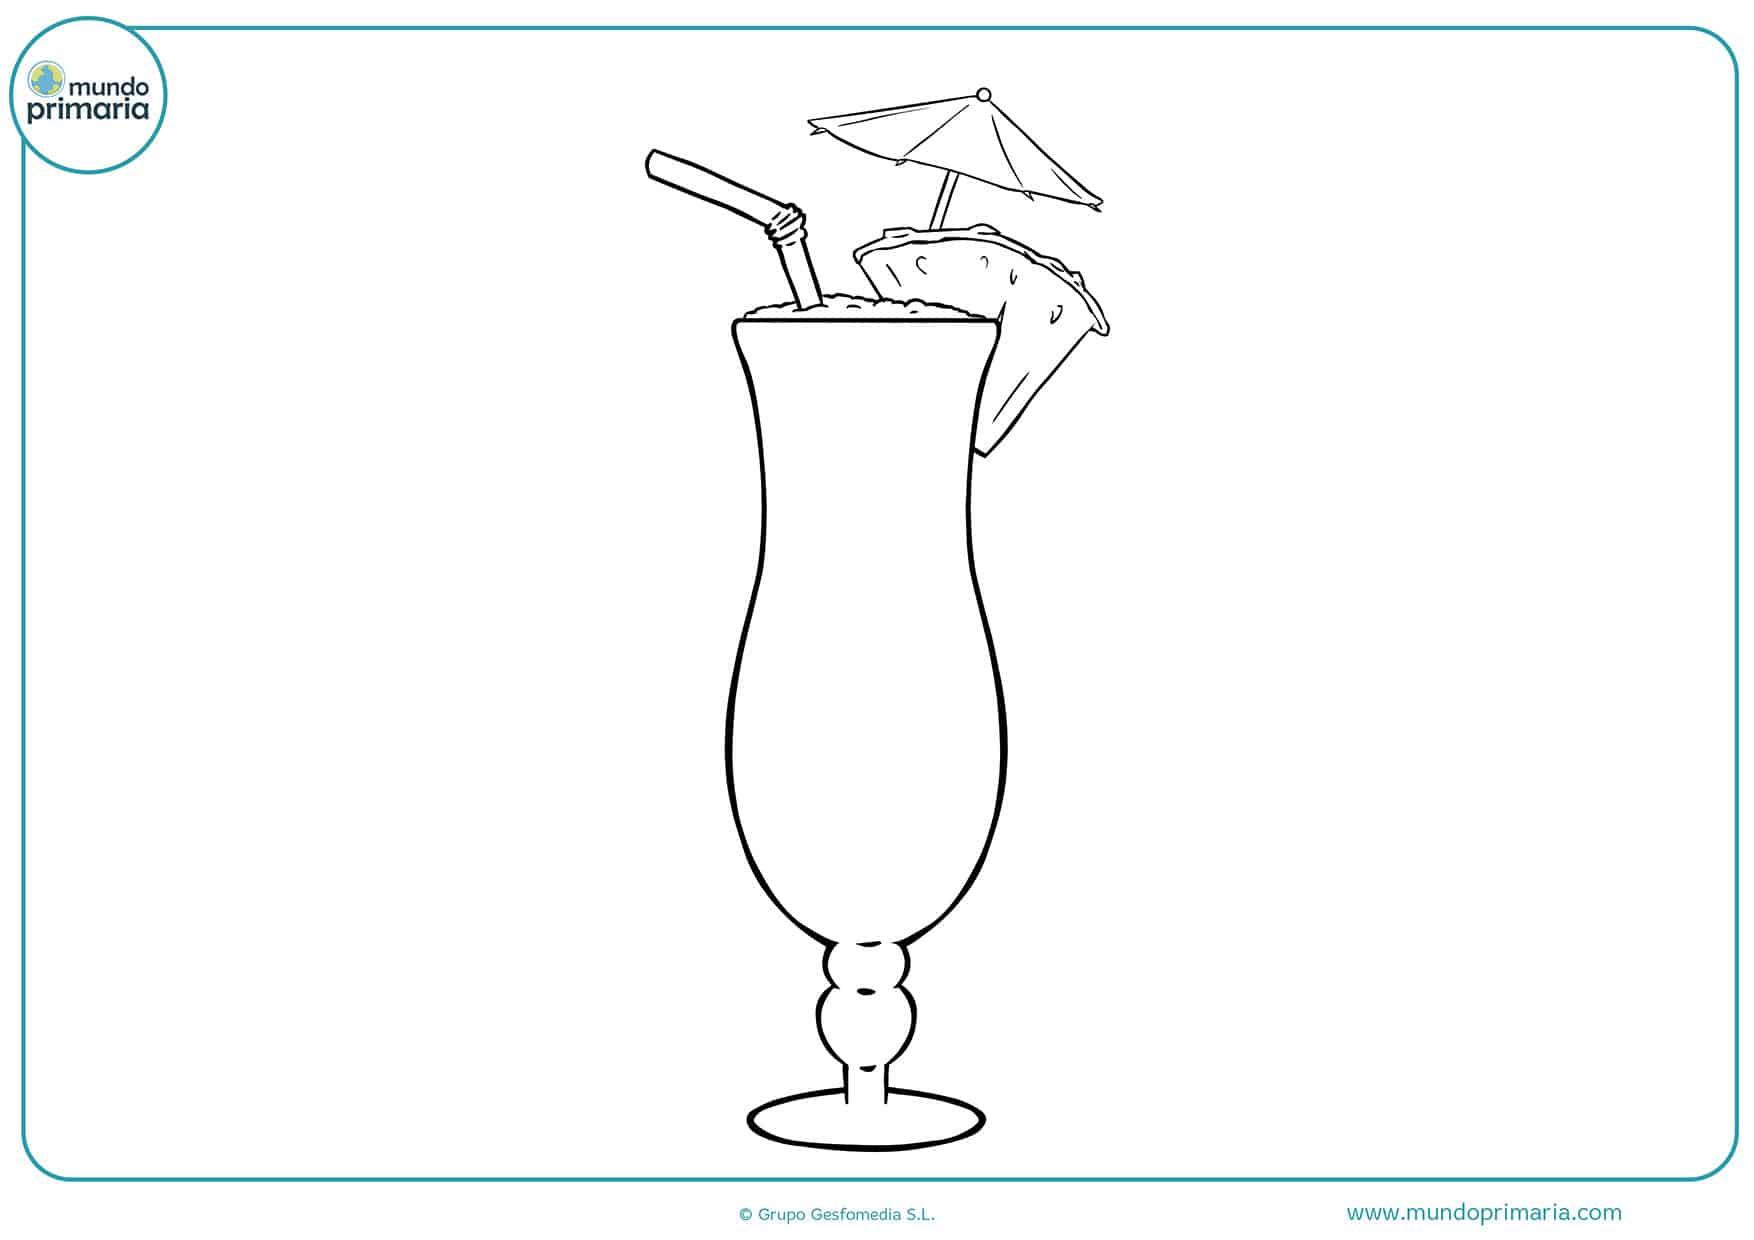 Dibujos Religiosos Para Colorear E Imprimir: Dibujos De Bebida Para Colorear